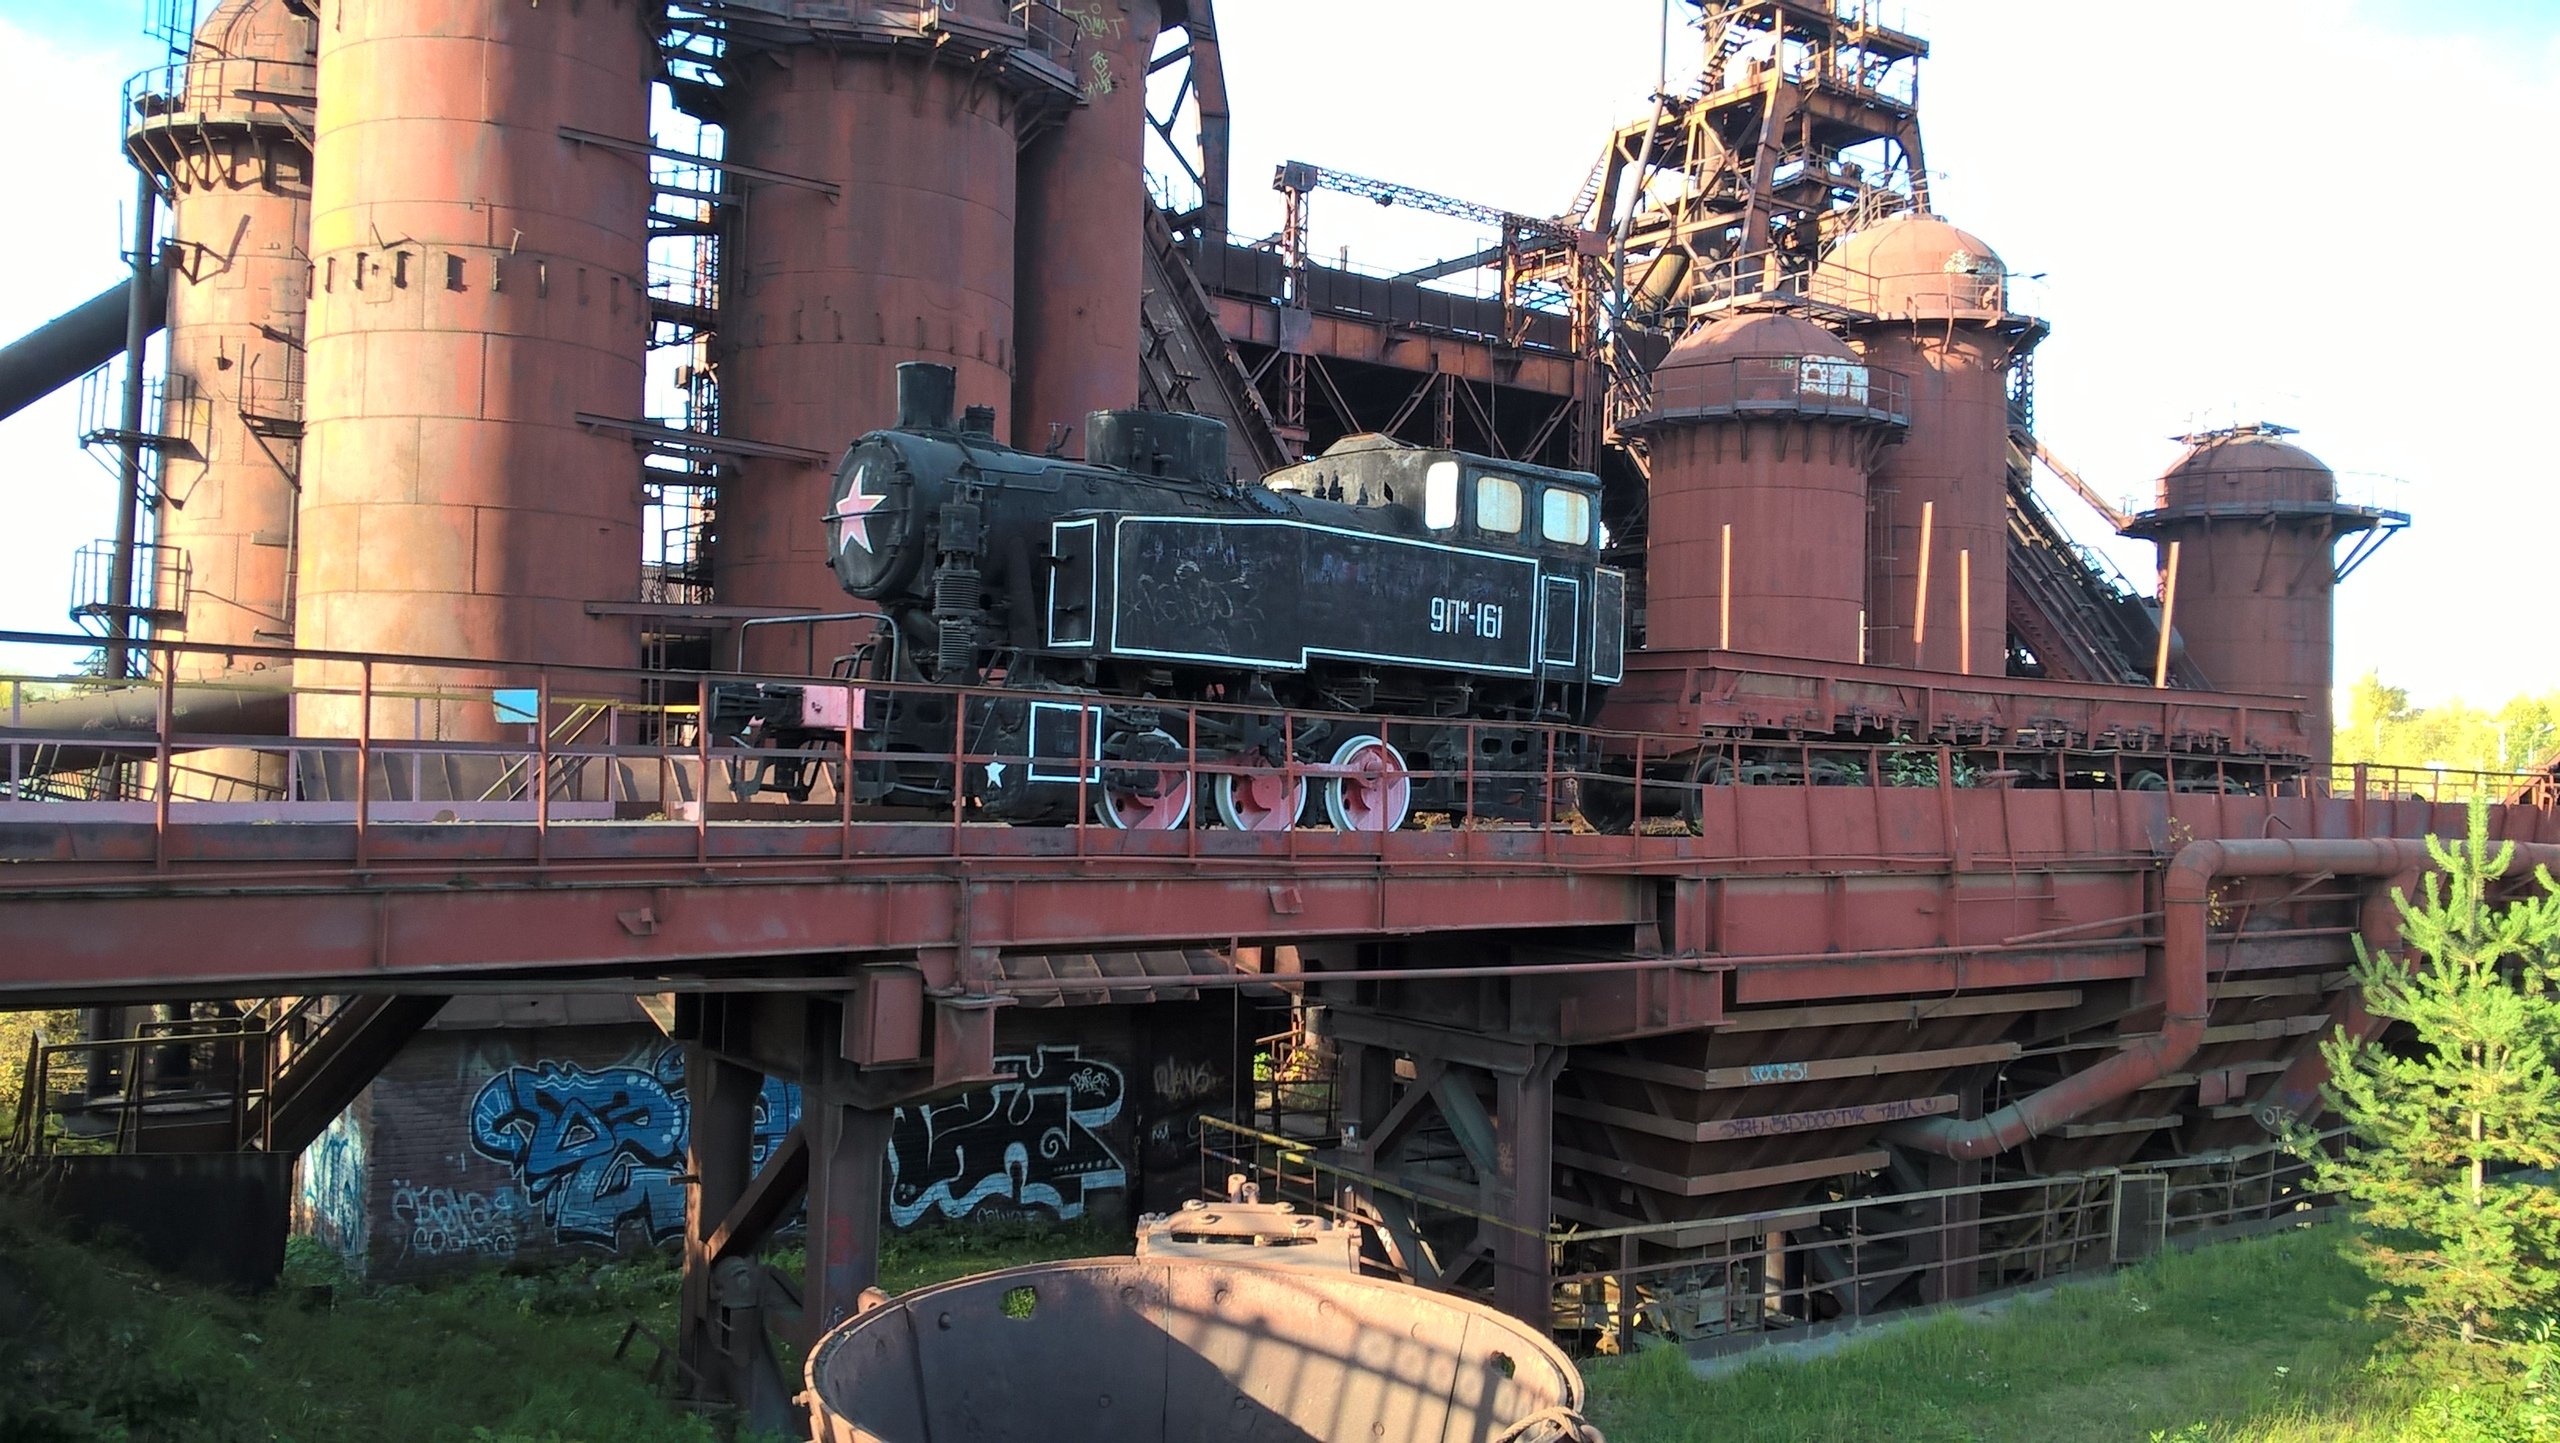 Вид на музей-завод Нижнего Тагила из-за забора.